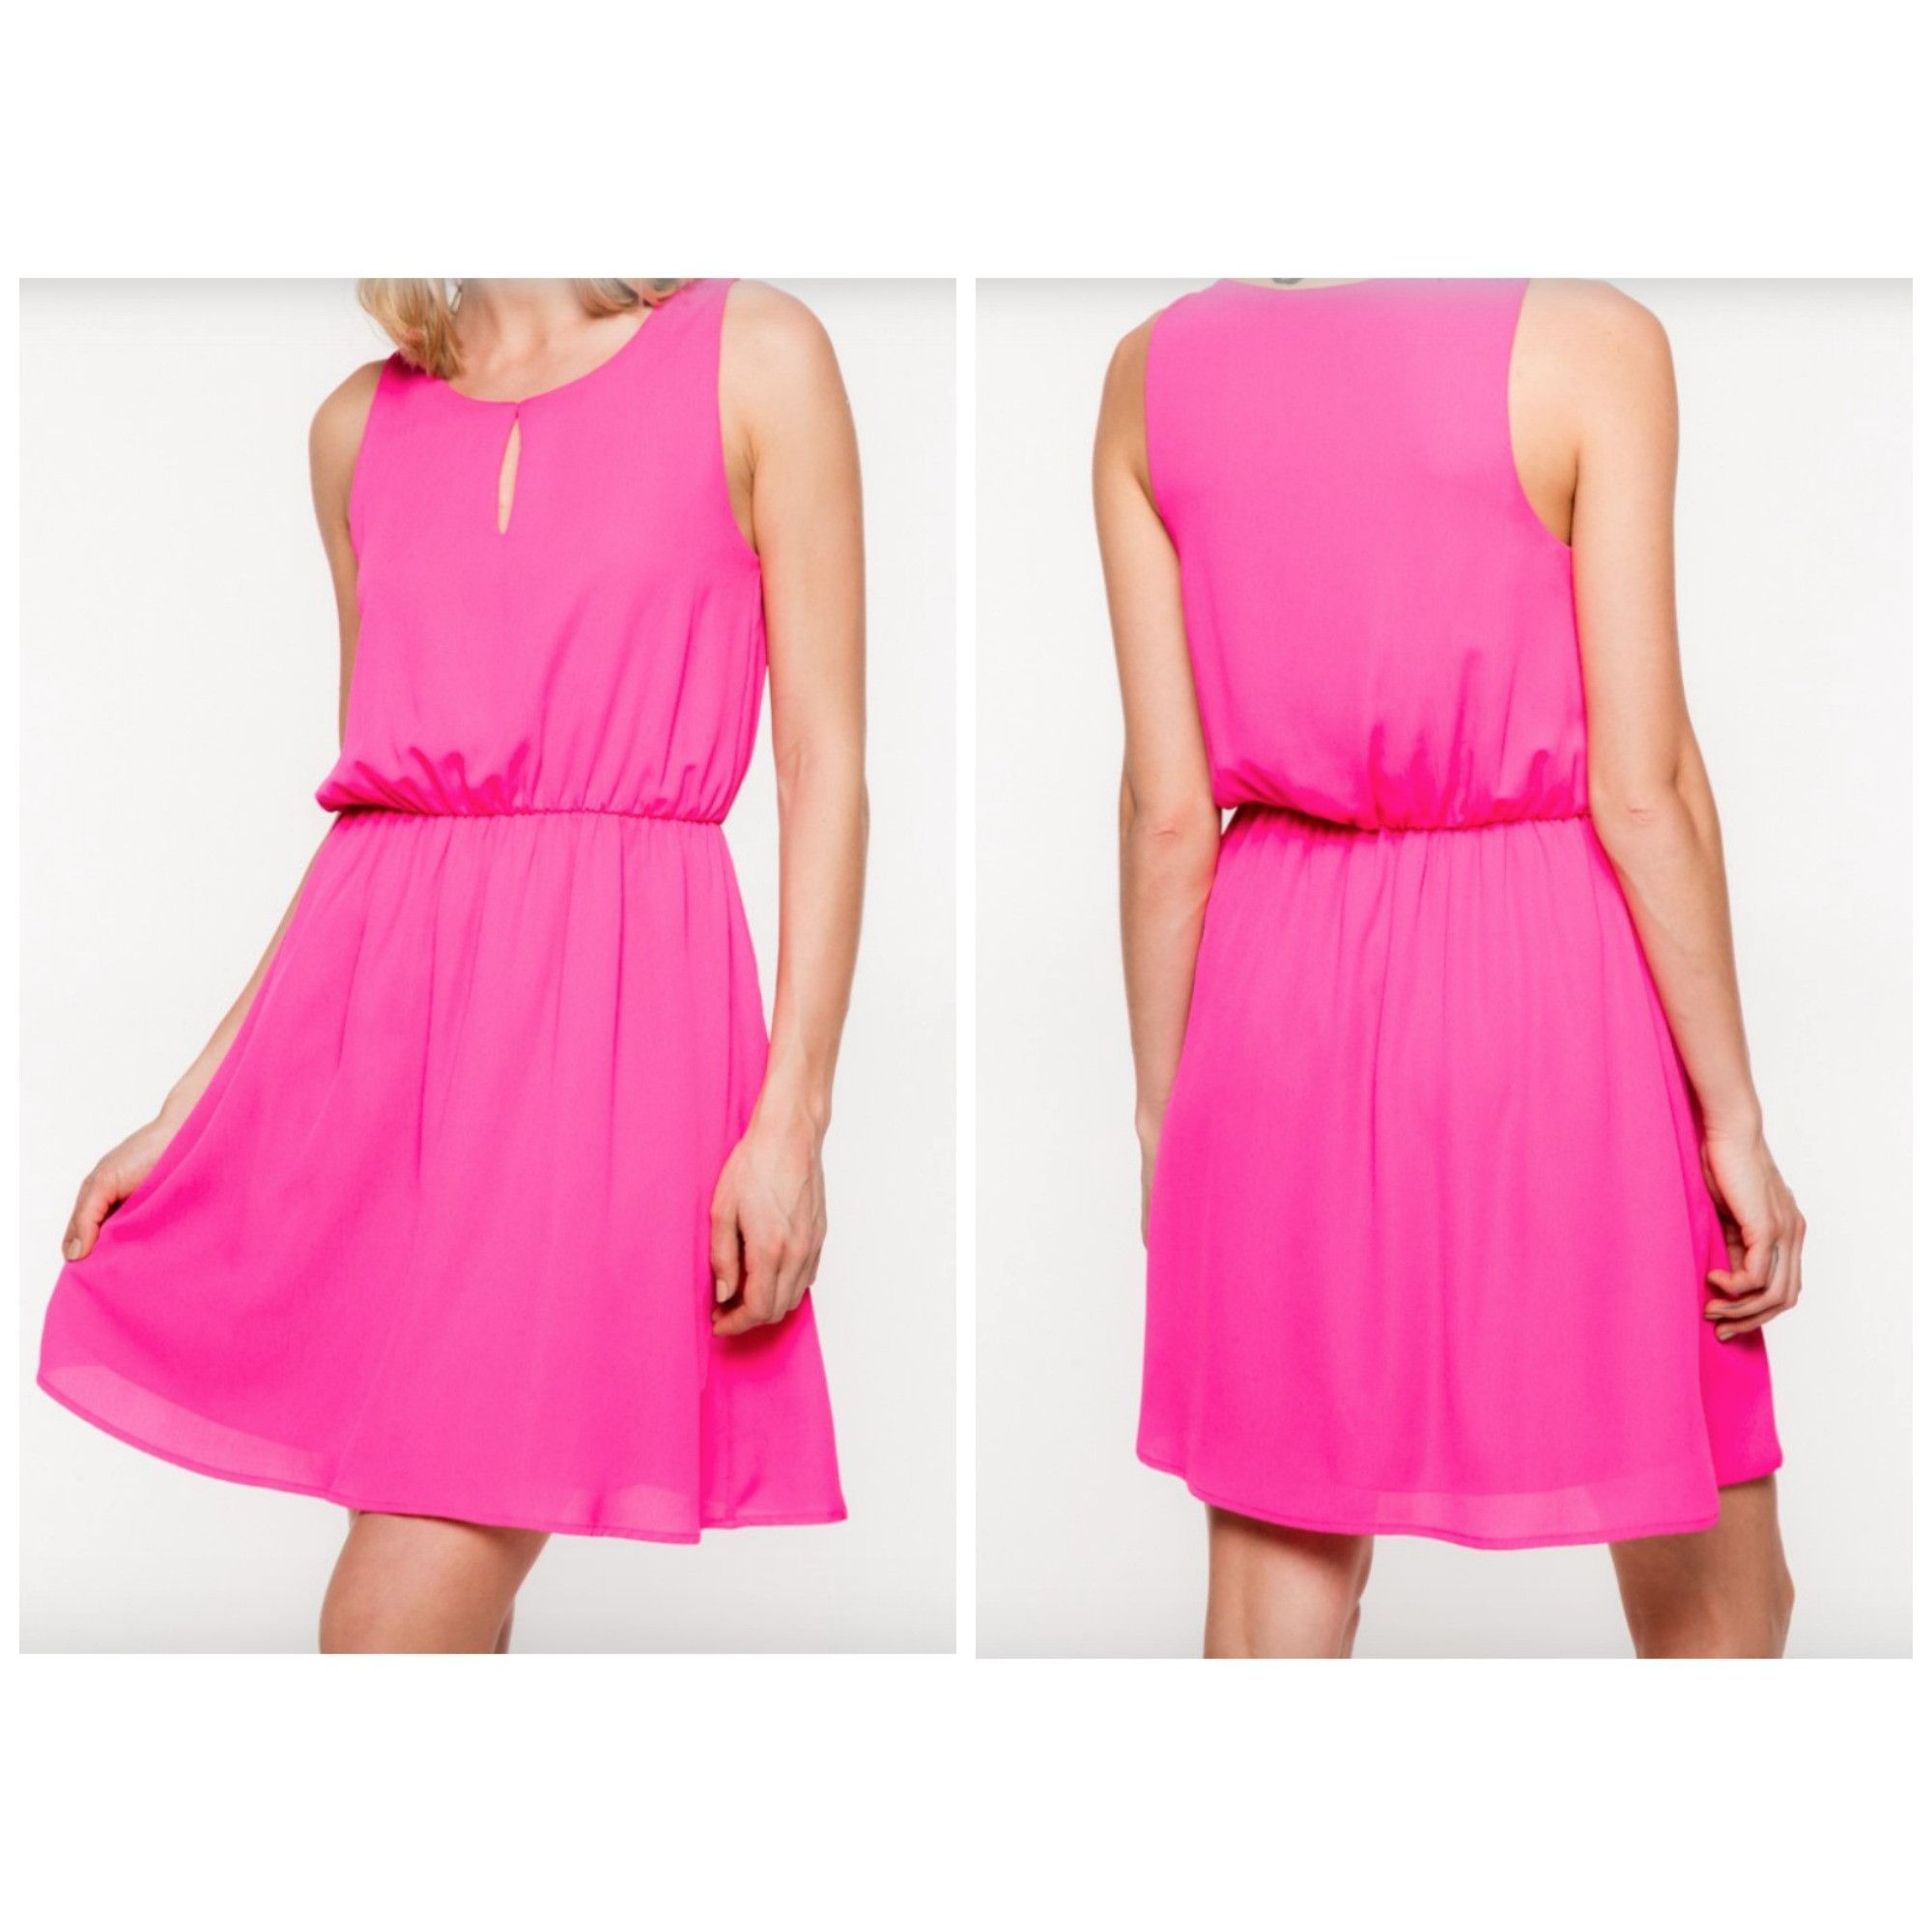 Solid Fuchsia Sleeveless Front Keyhole Dress